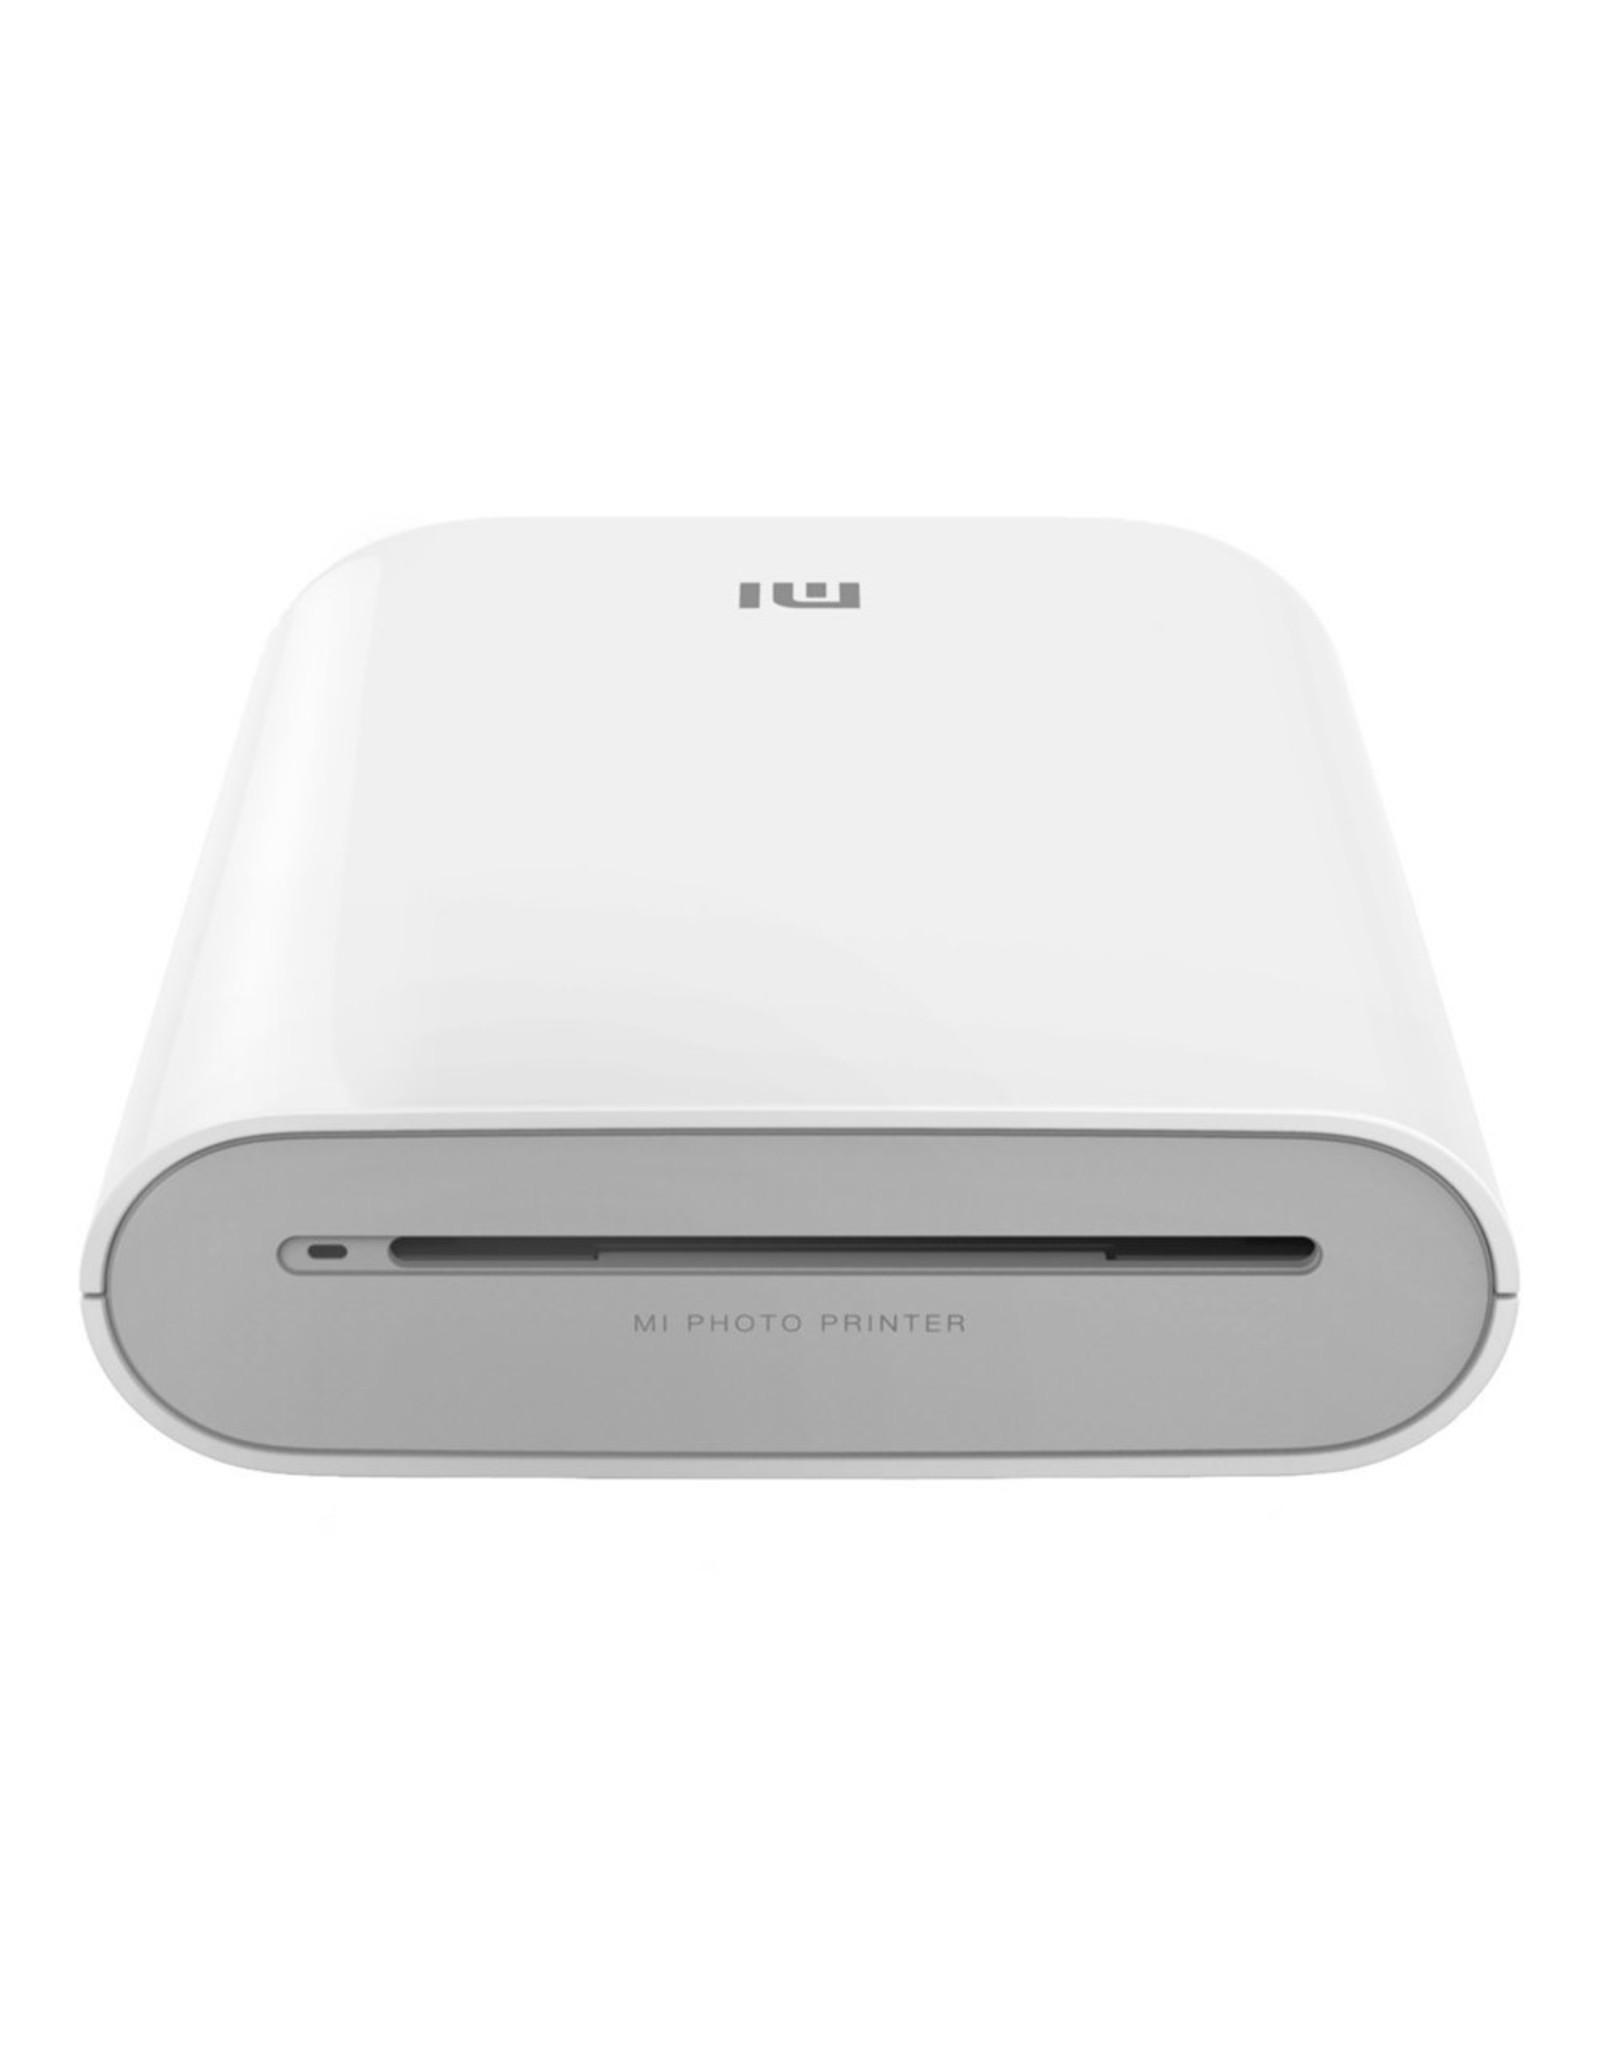 Xiaomi Mi Portable Photo Printer - Draadloos Fotoprinter (refurbished)